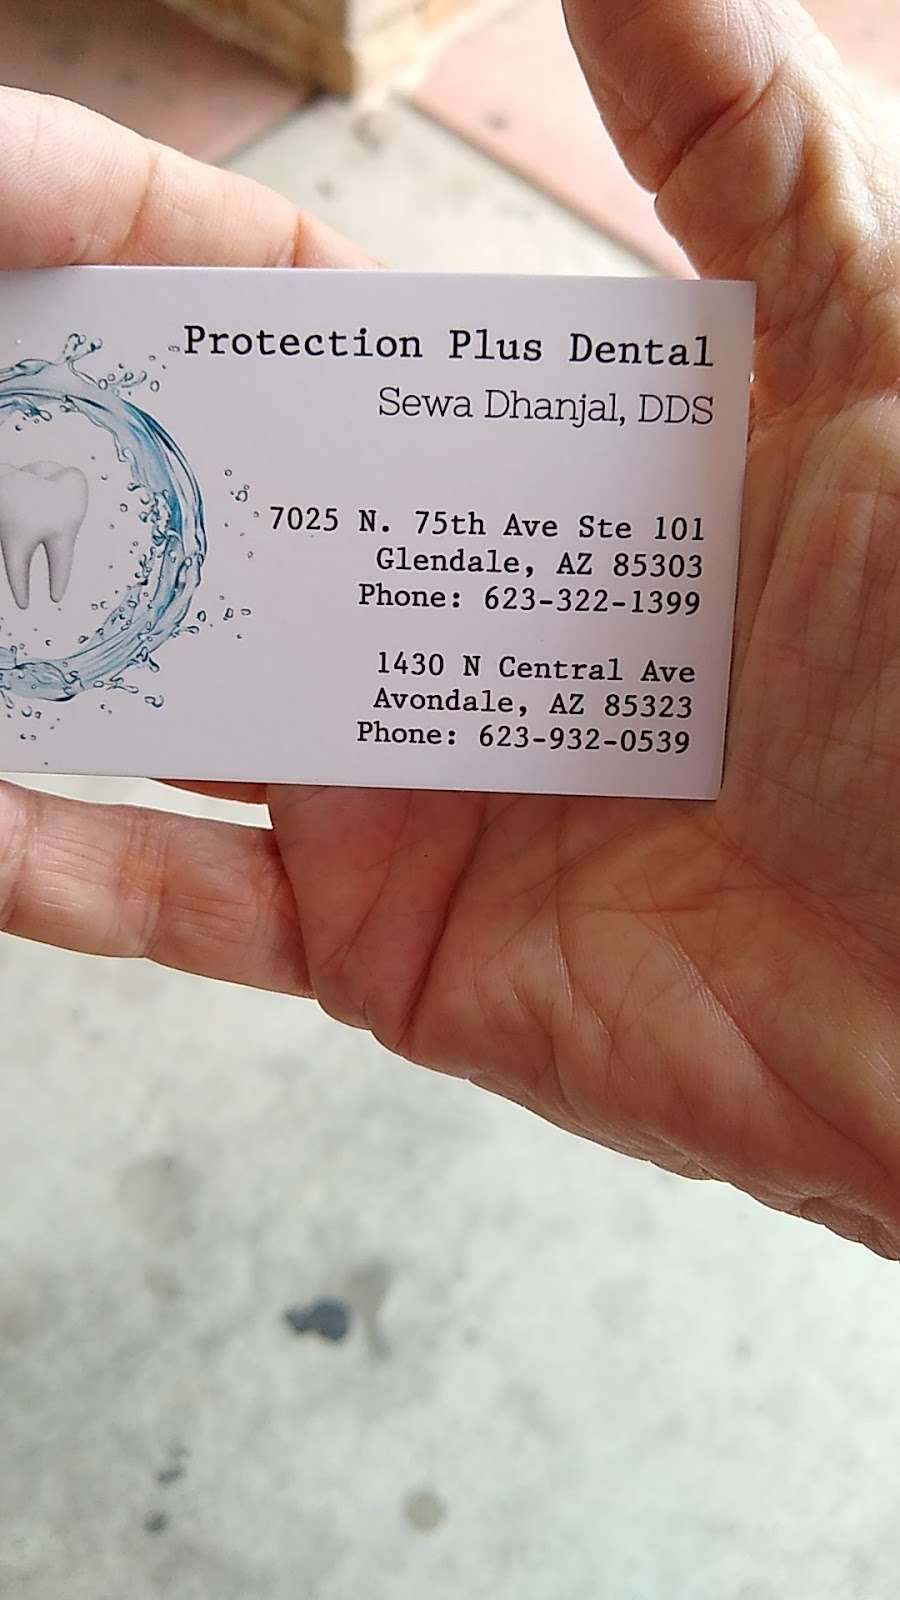 Protection Plus Dental Glendale - dentist  | Photo 9 of 10 | Address: 7025 N 75th Ave #101, Glendale, AZ 85303, USA | Phone: (623) 322-1399